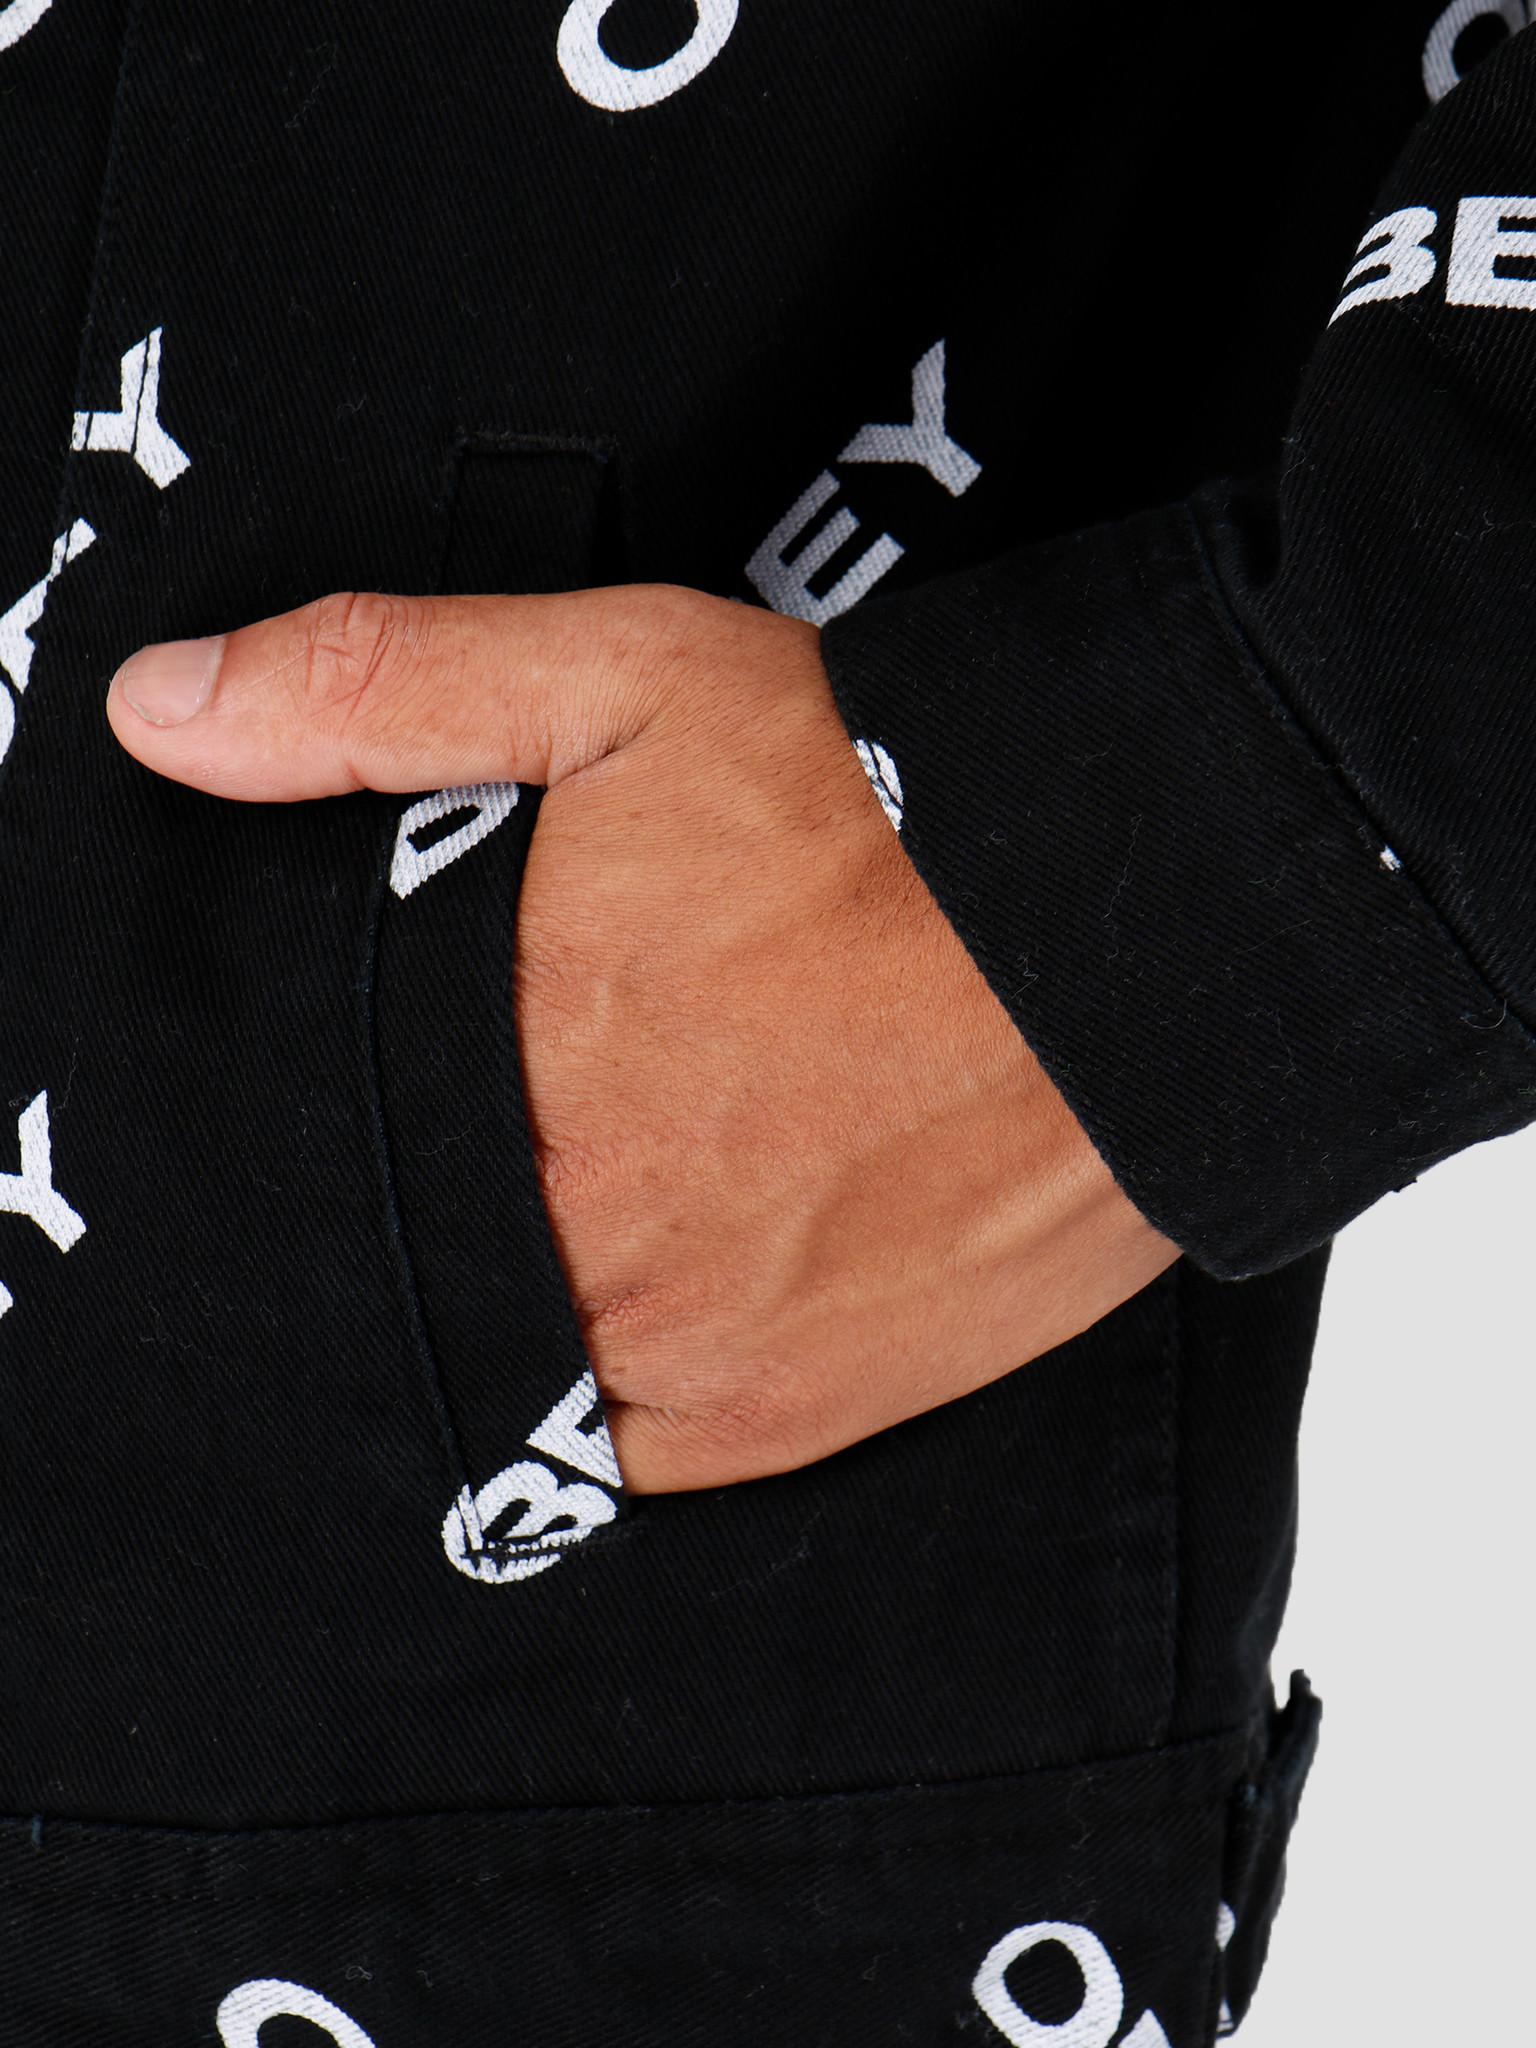 Obey Obey Dynamite Jacket Slanted Black 121800391-BLK